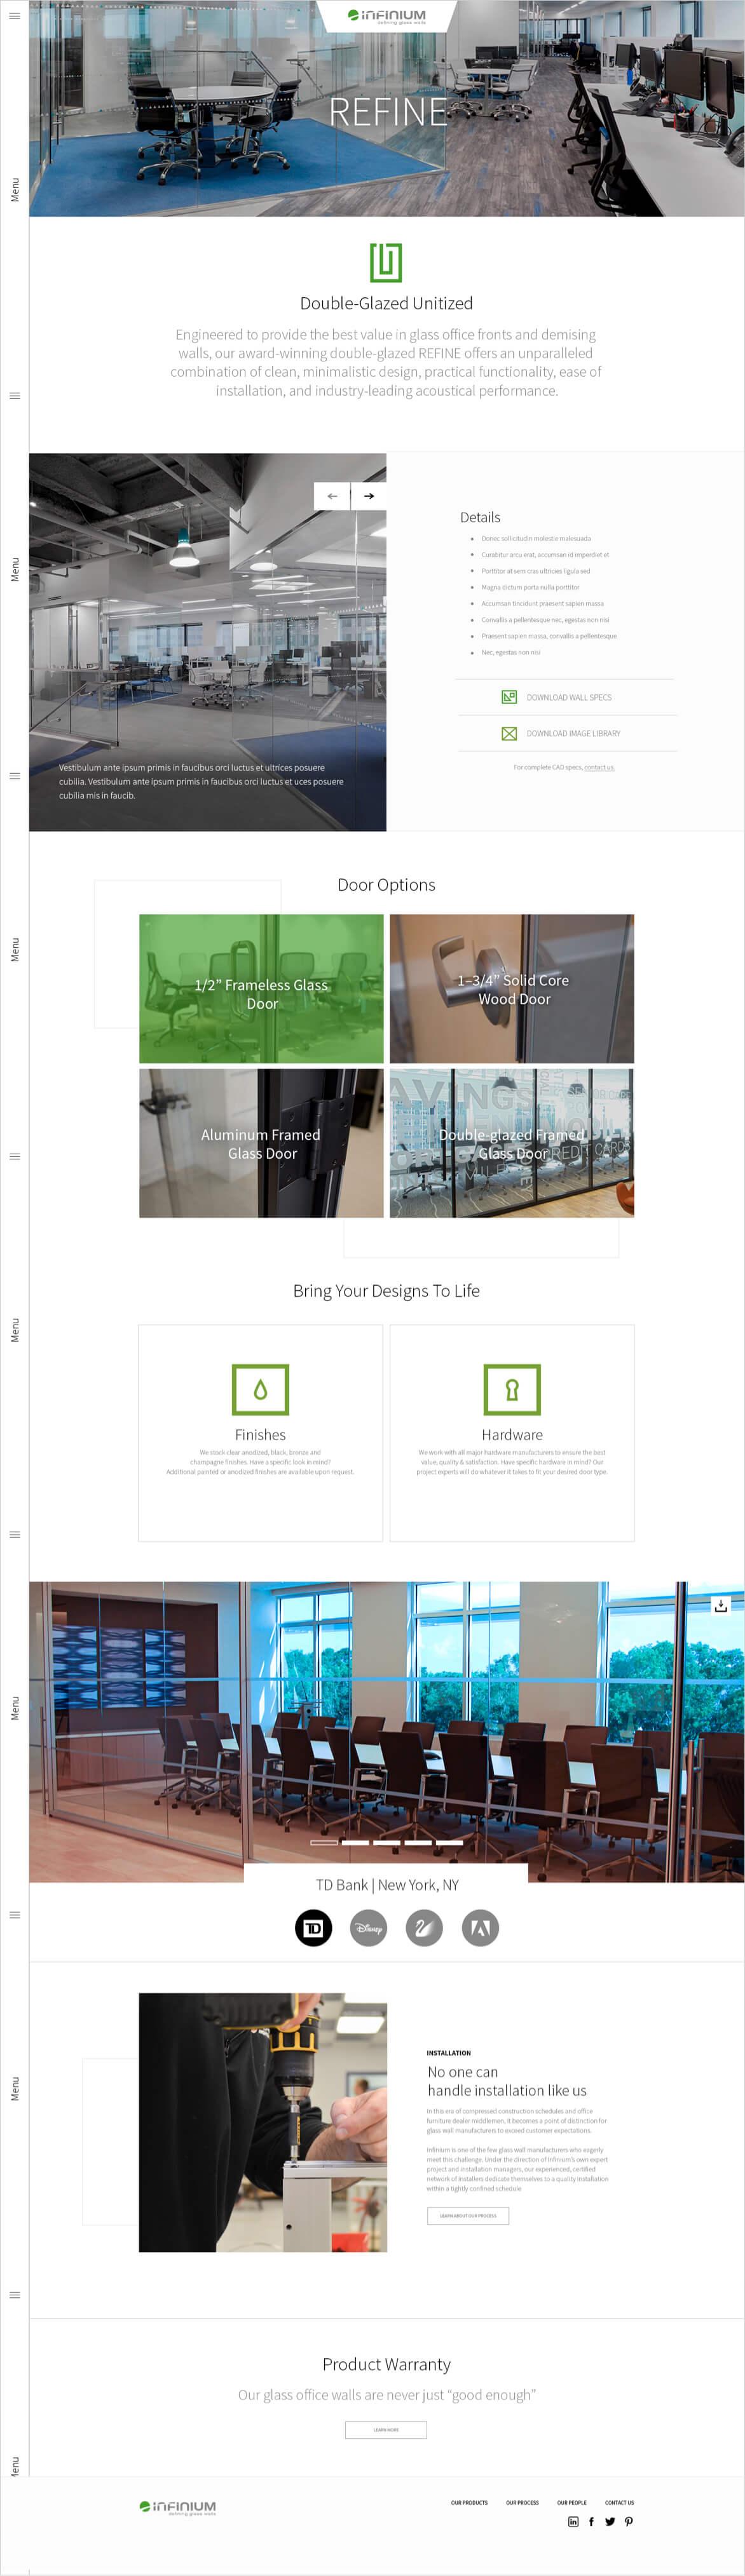 InfiniumWalls_ProductDetailPage (2)